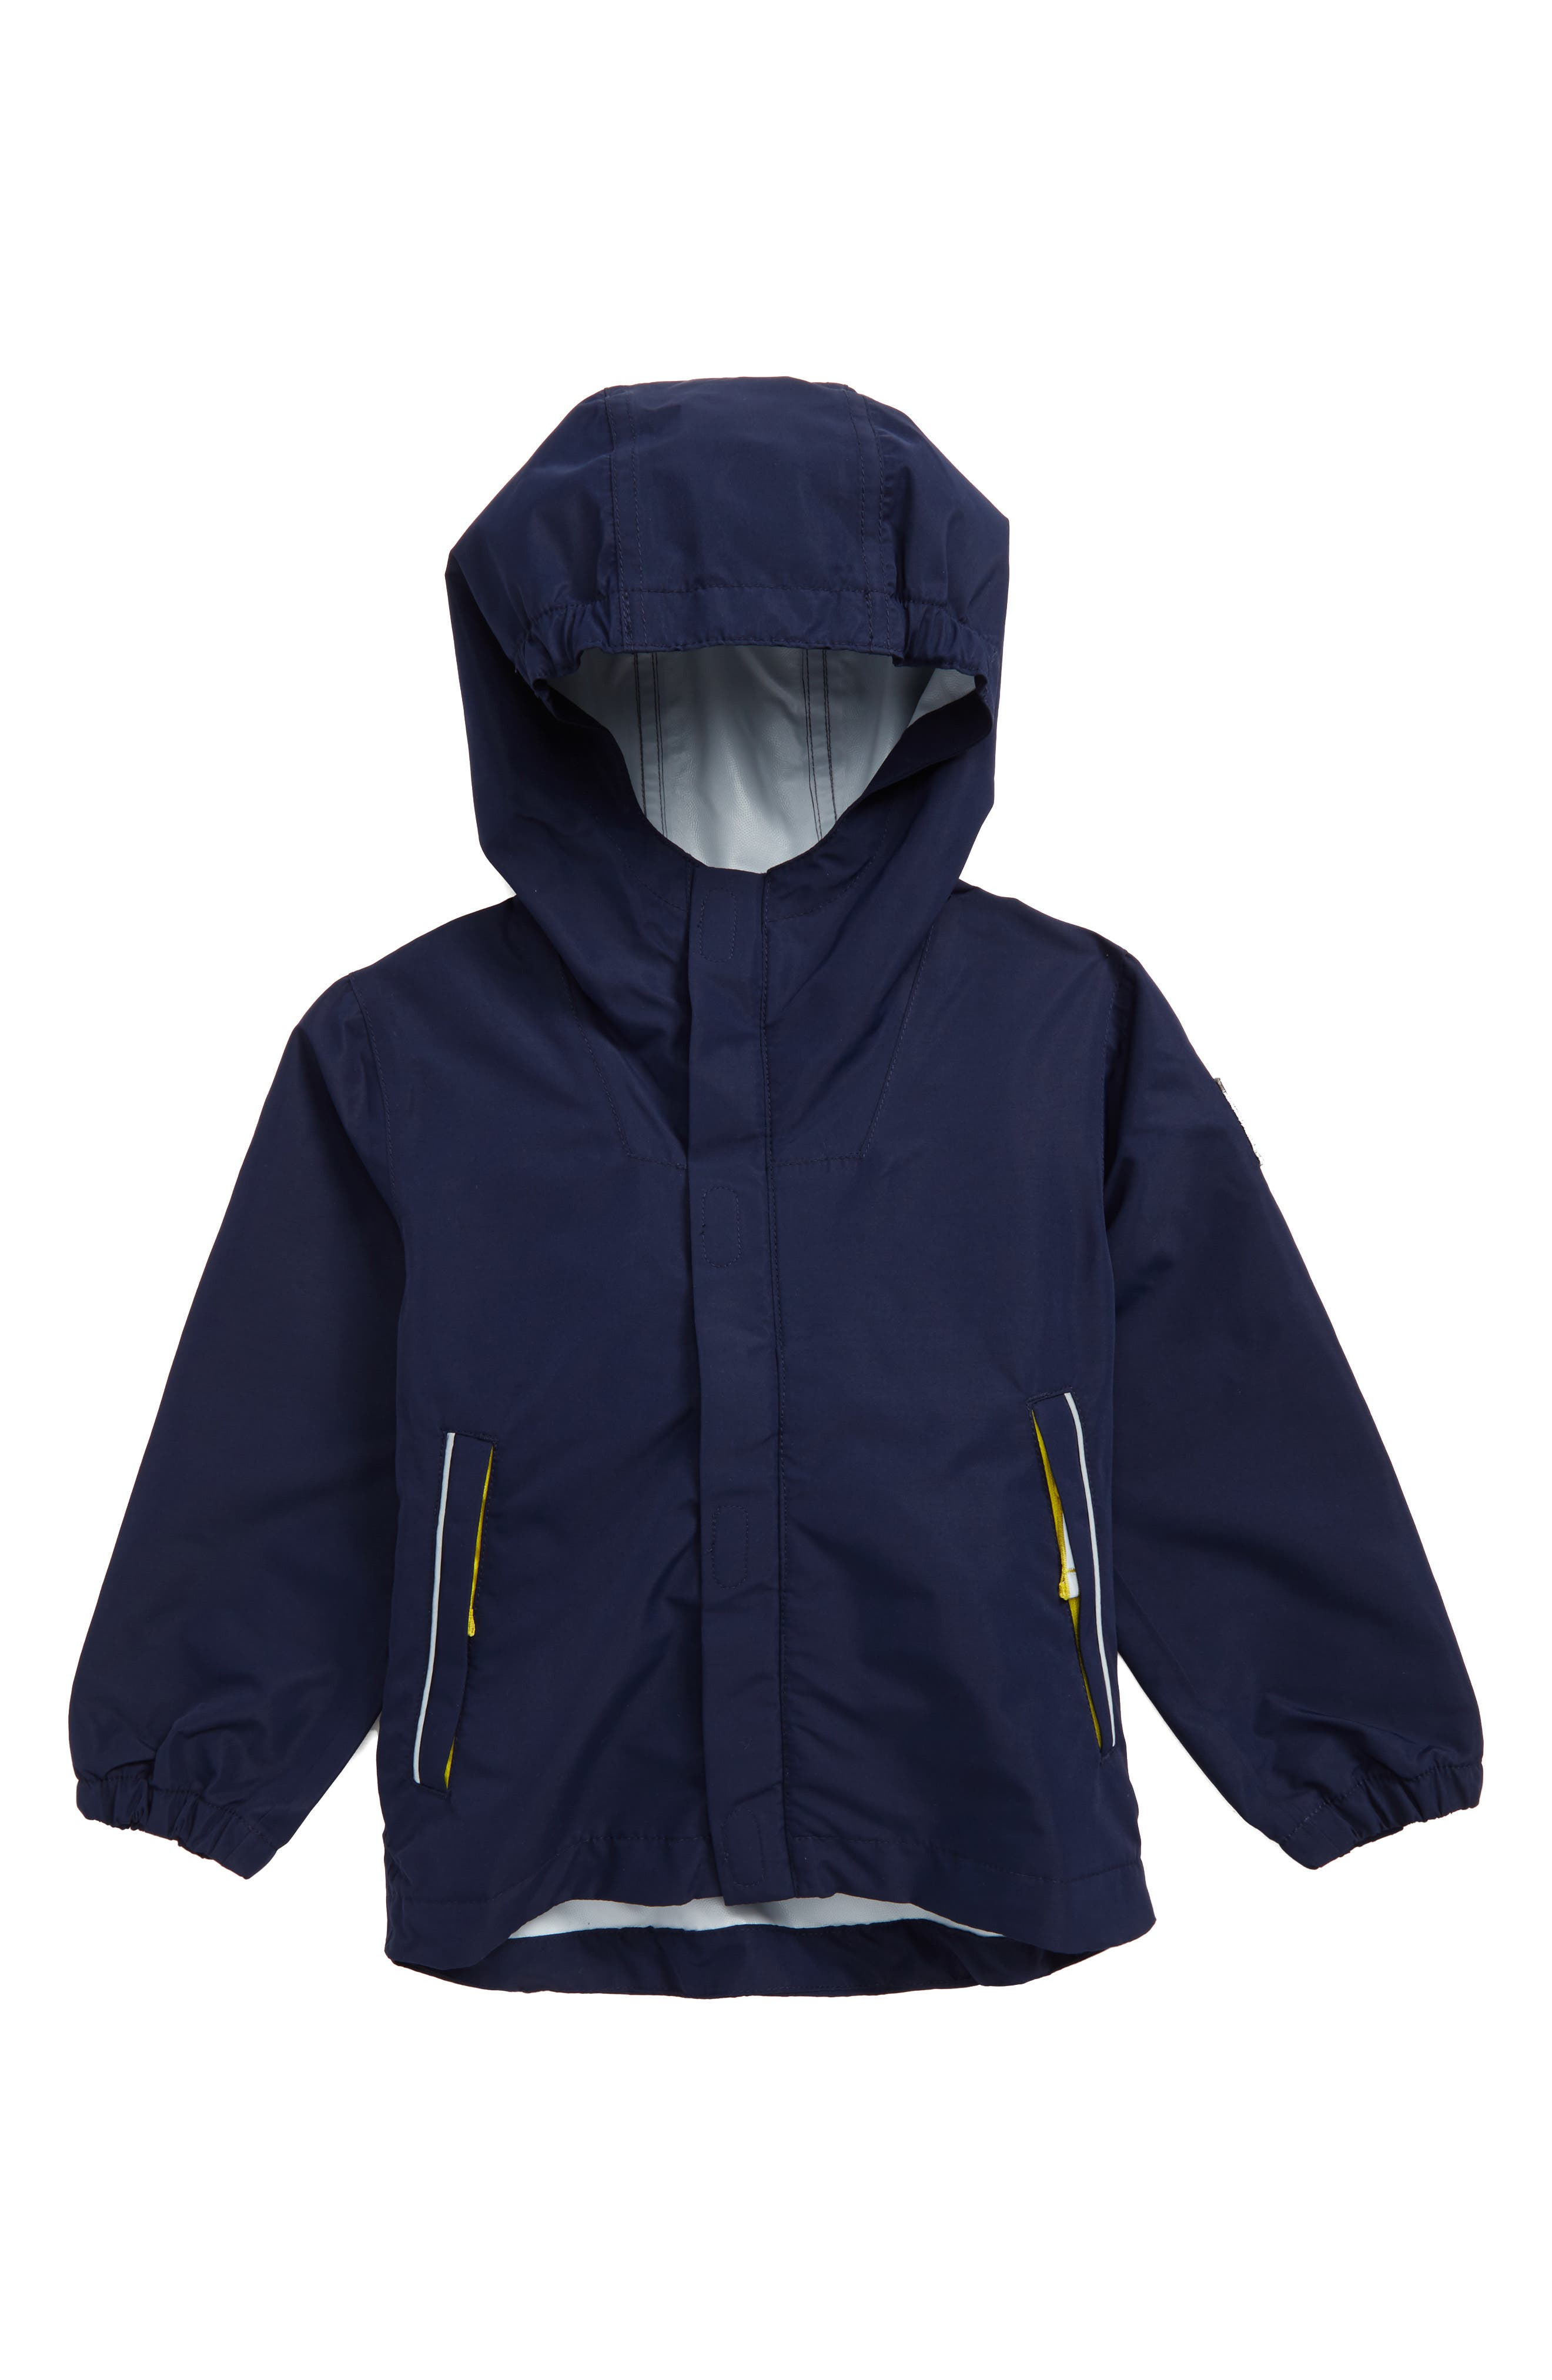 Alternate Image 1 Selected - Mini Boden Packaway Waterproof Jacket (Toddler Boys, Little Boys & Big Boys)